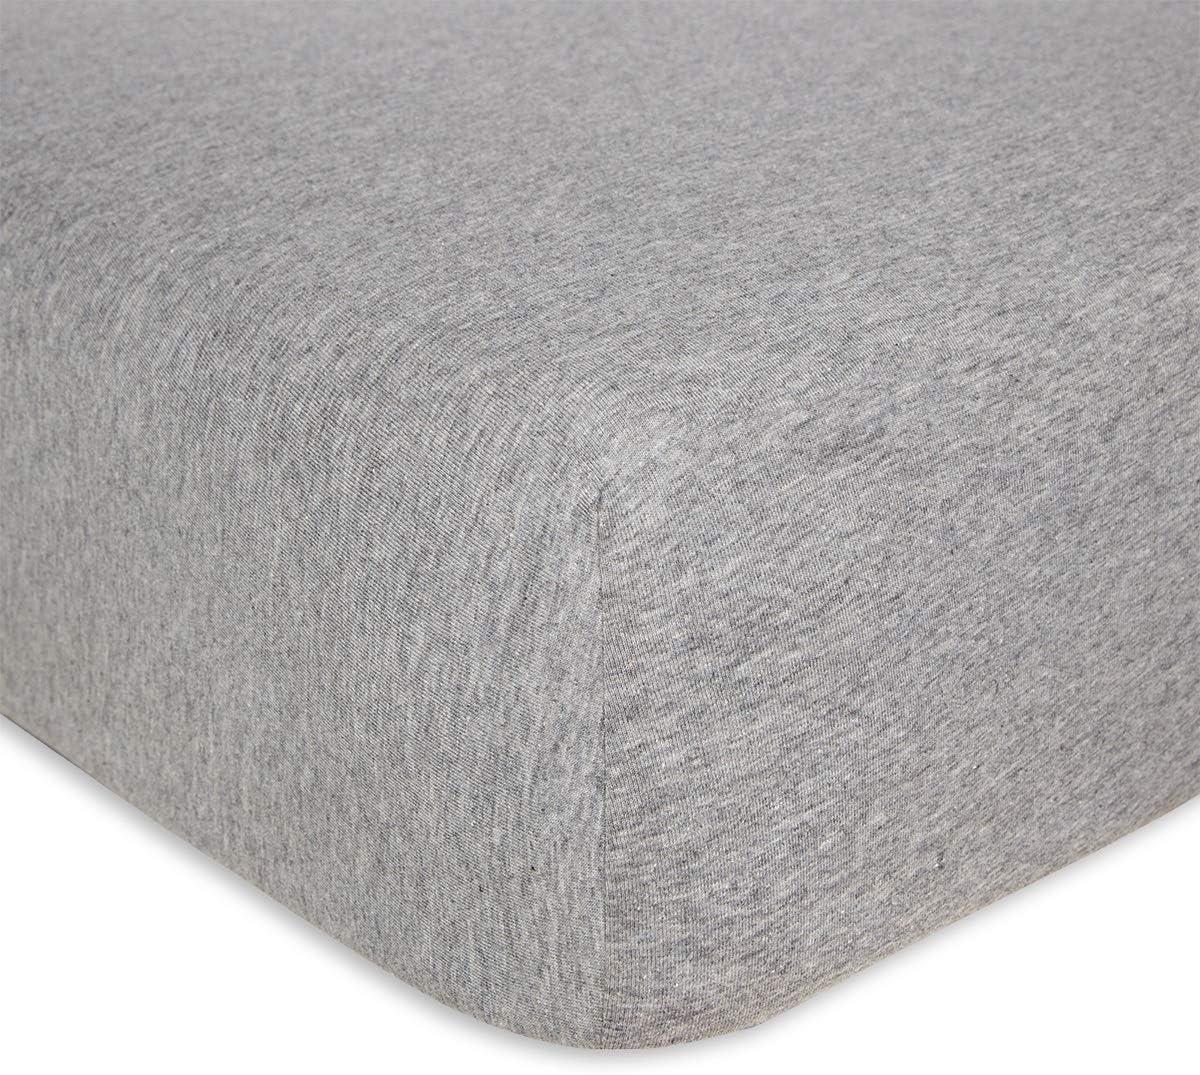 Bed sheet 100/% Organic Cotton Toddler Sheet Fits standard crib mattress 28x52 Unisex Baby Nursery Bedding Woodland Crib Sheet